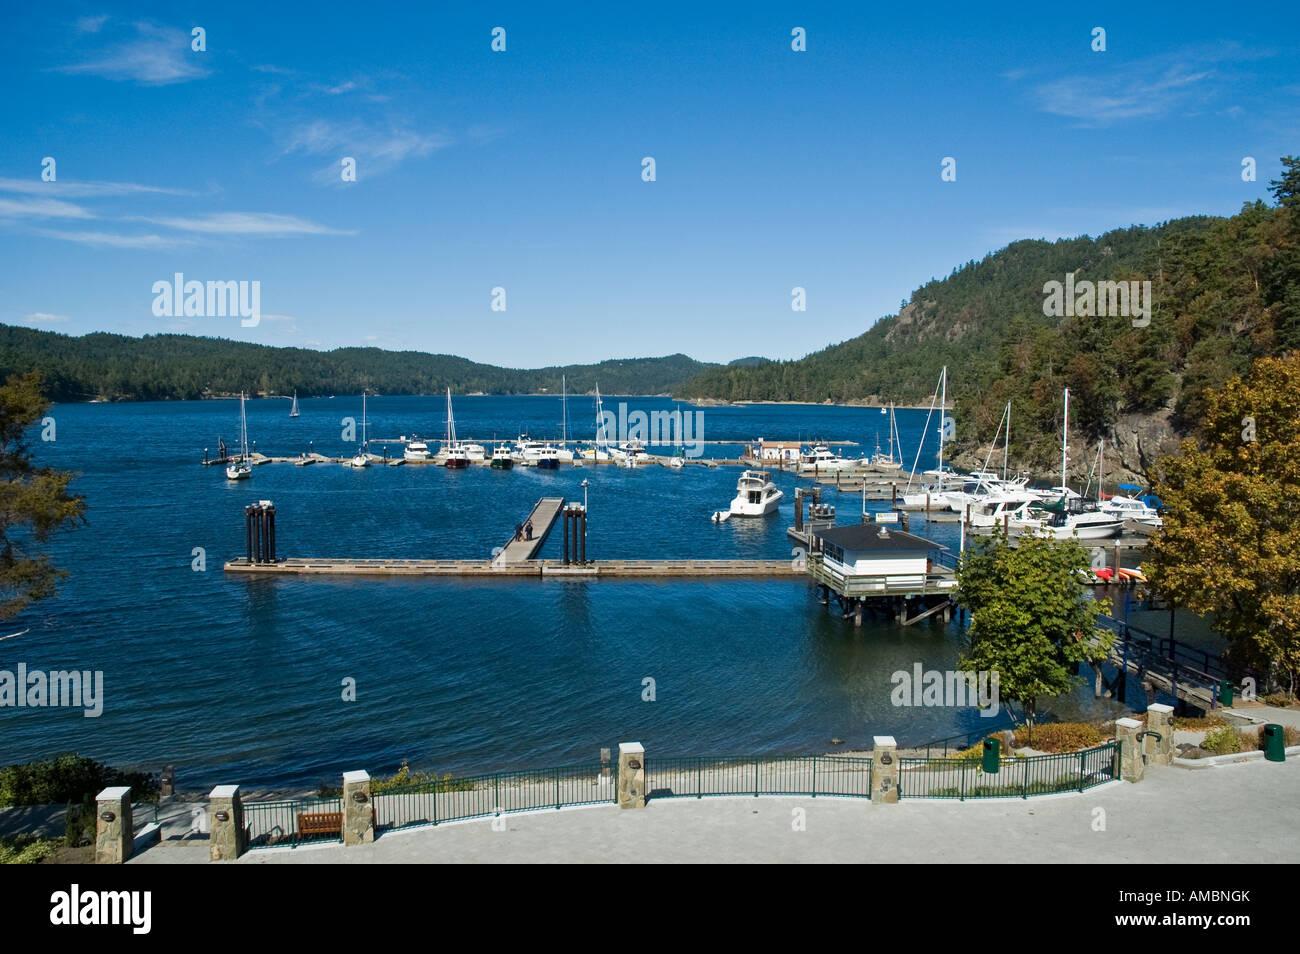 St Anne Island Resort